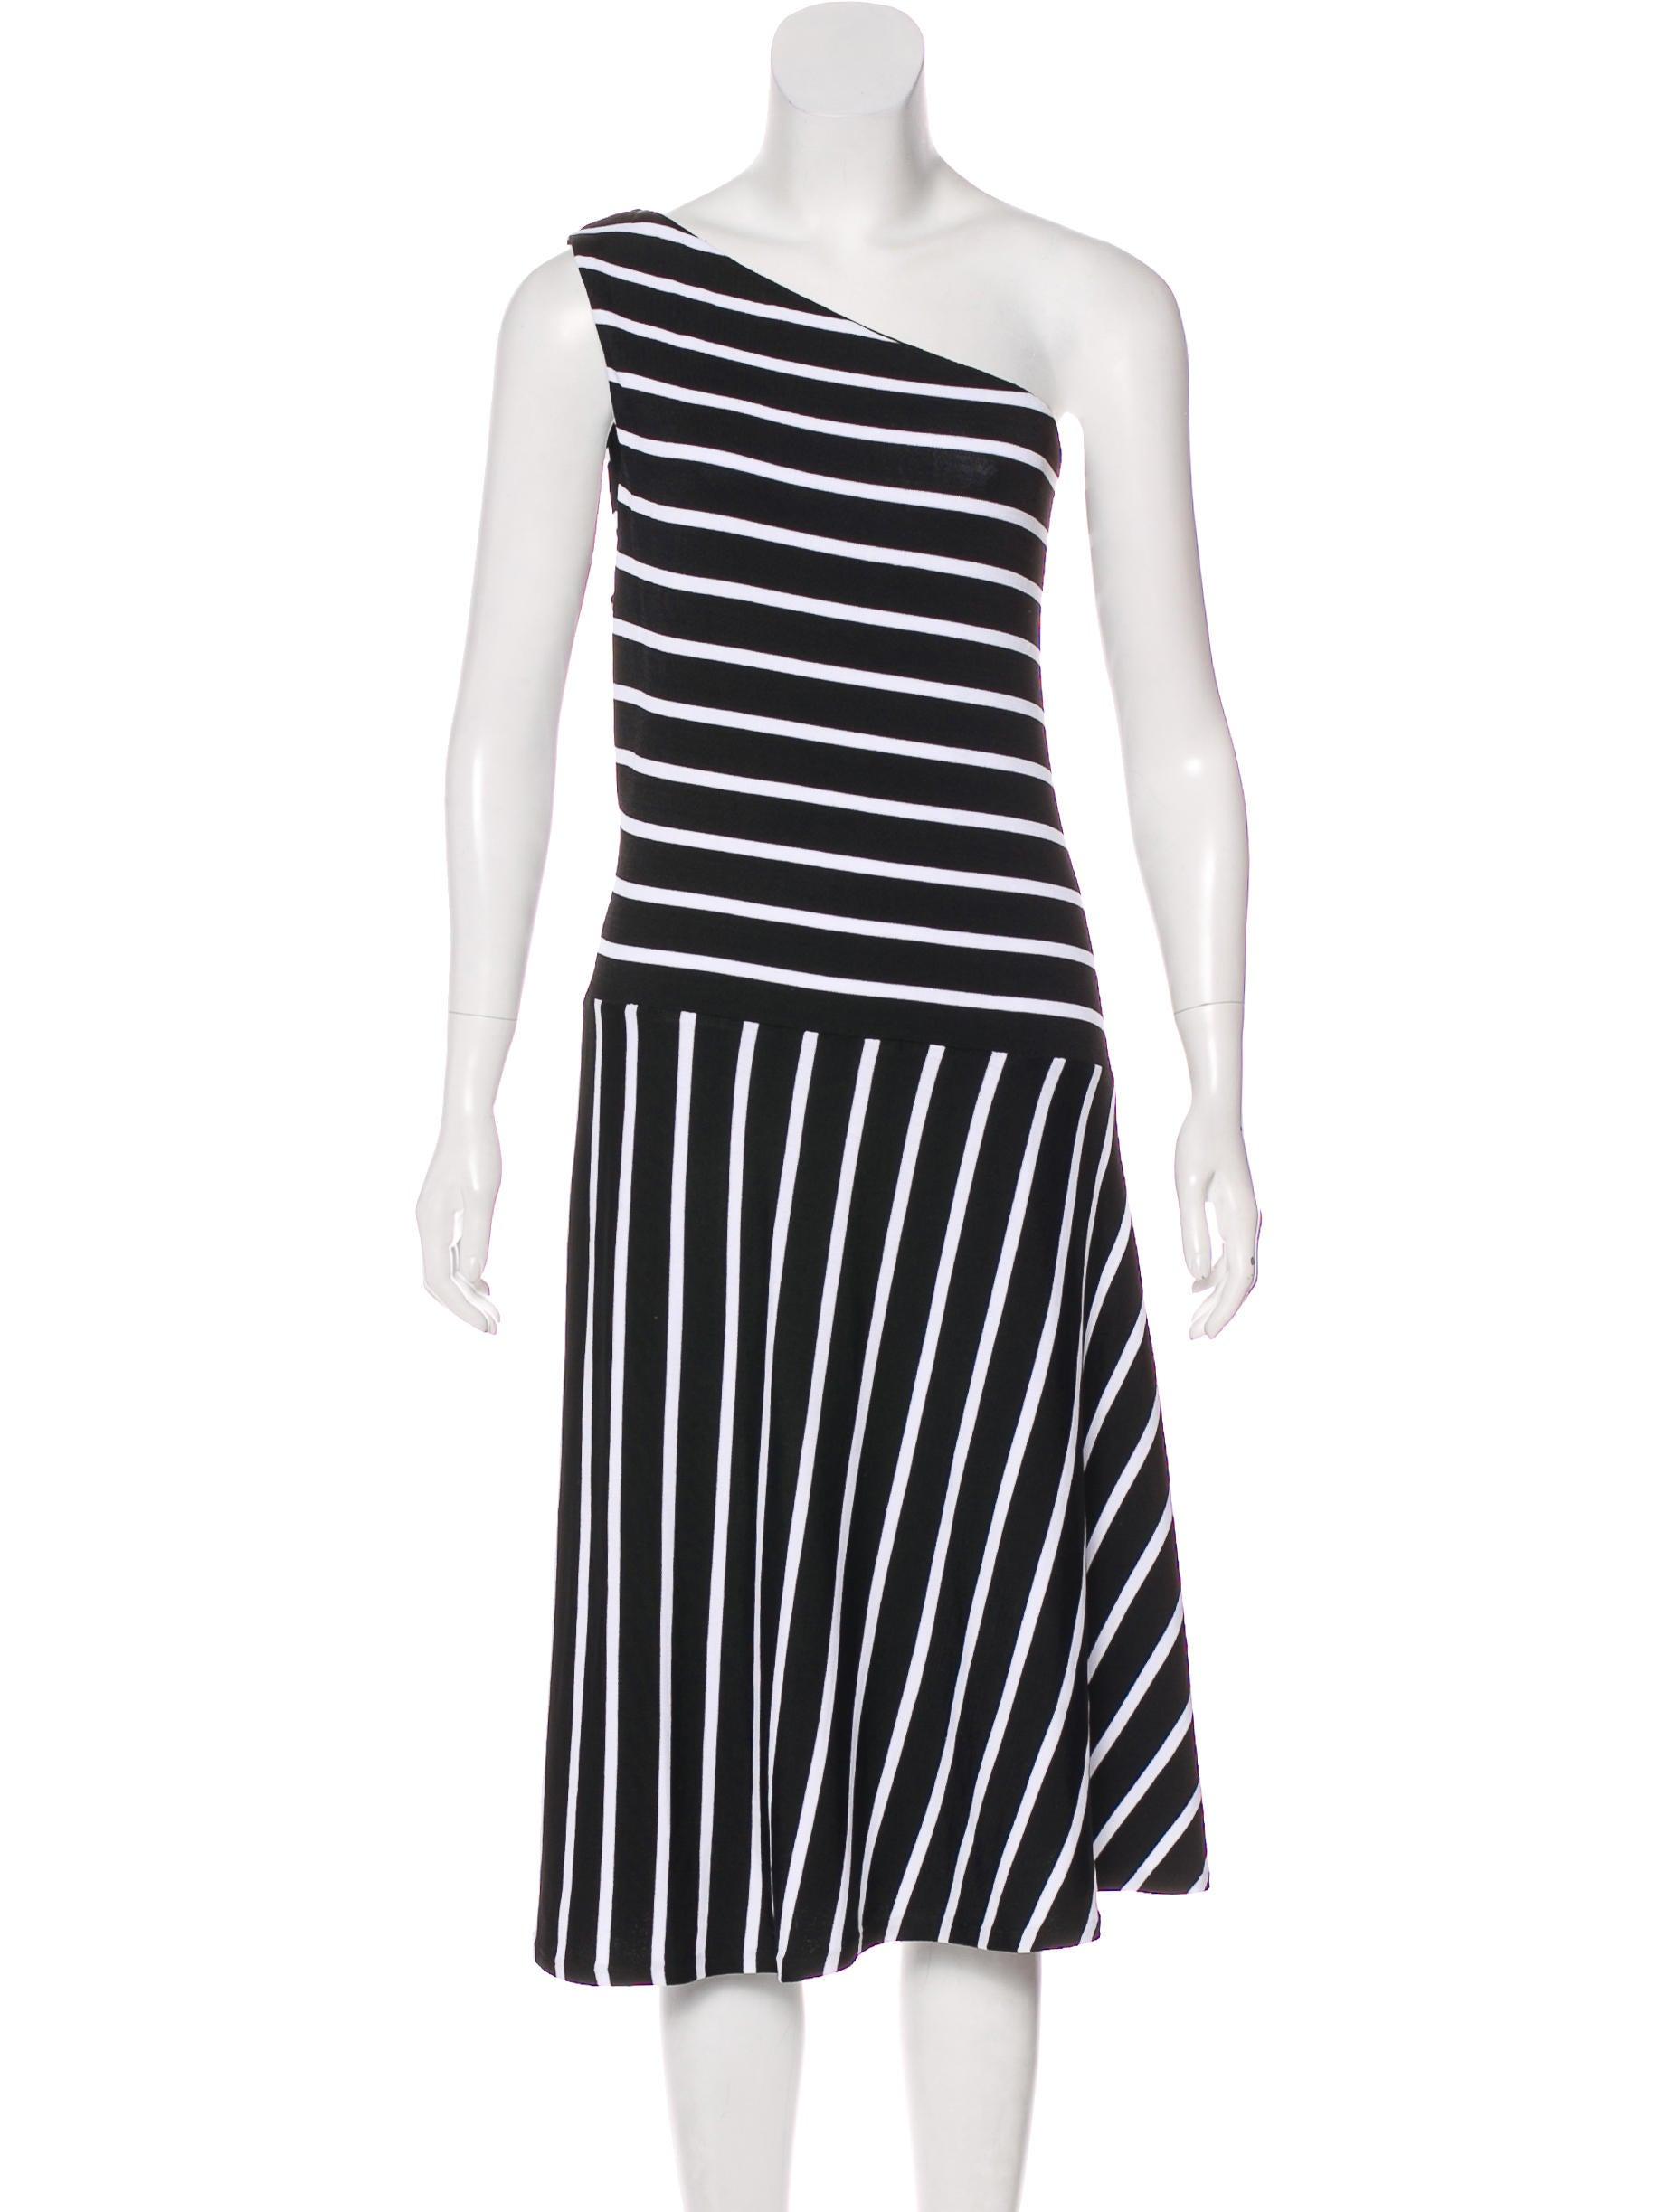 Lauren Ralph Lauren One-Shoulder Striped Dress w/ Tags - Clothing ...